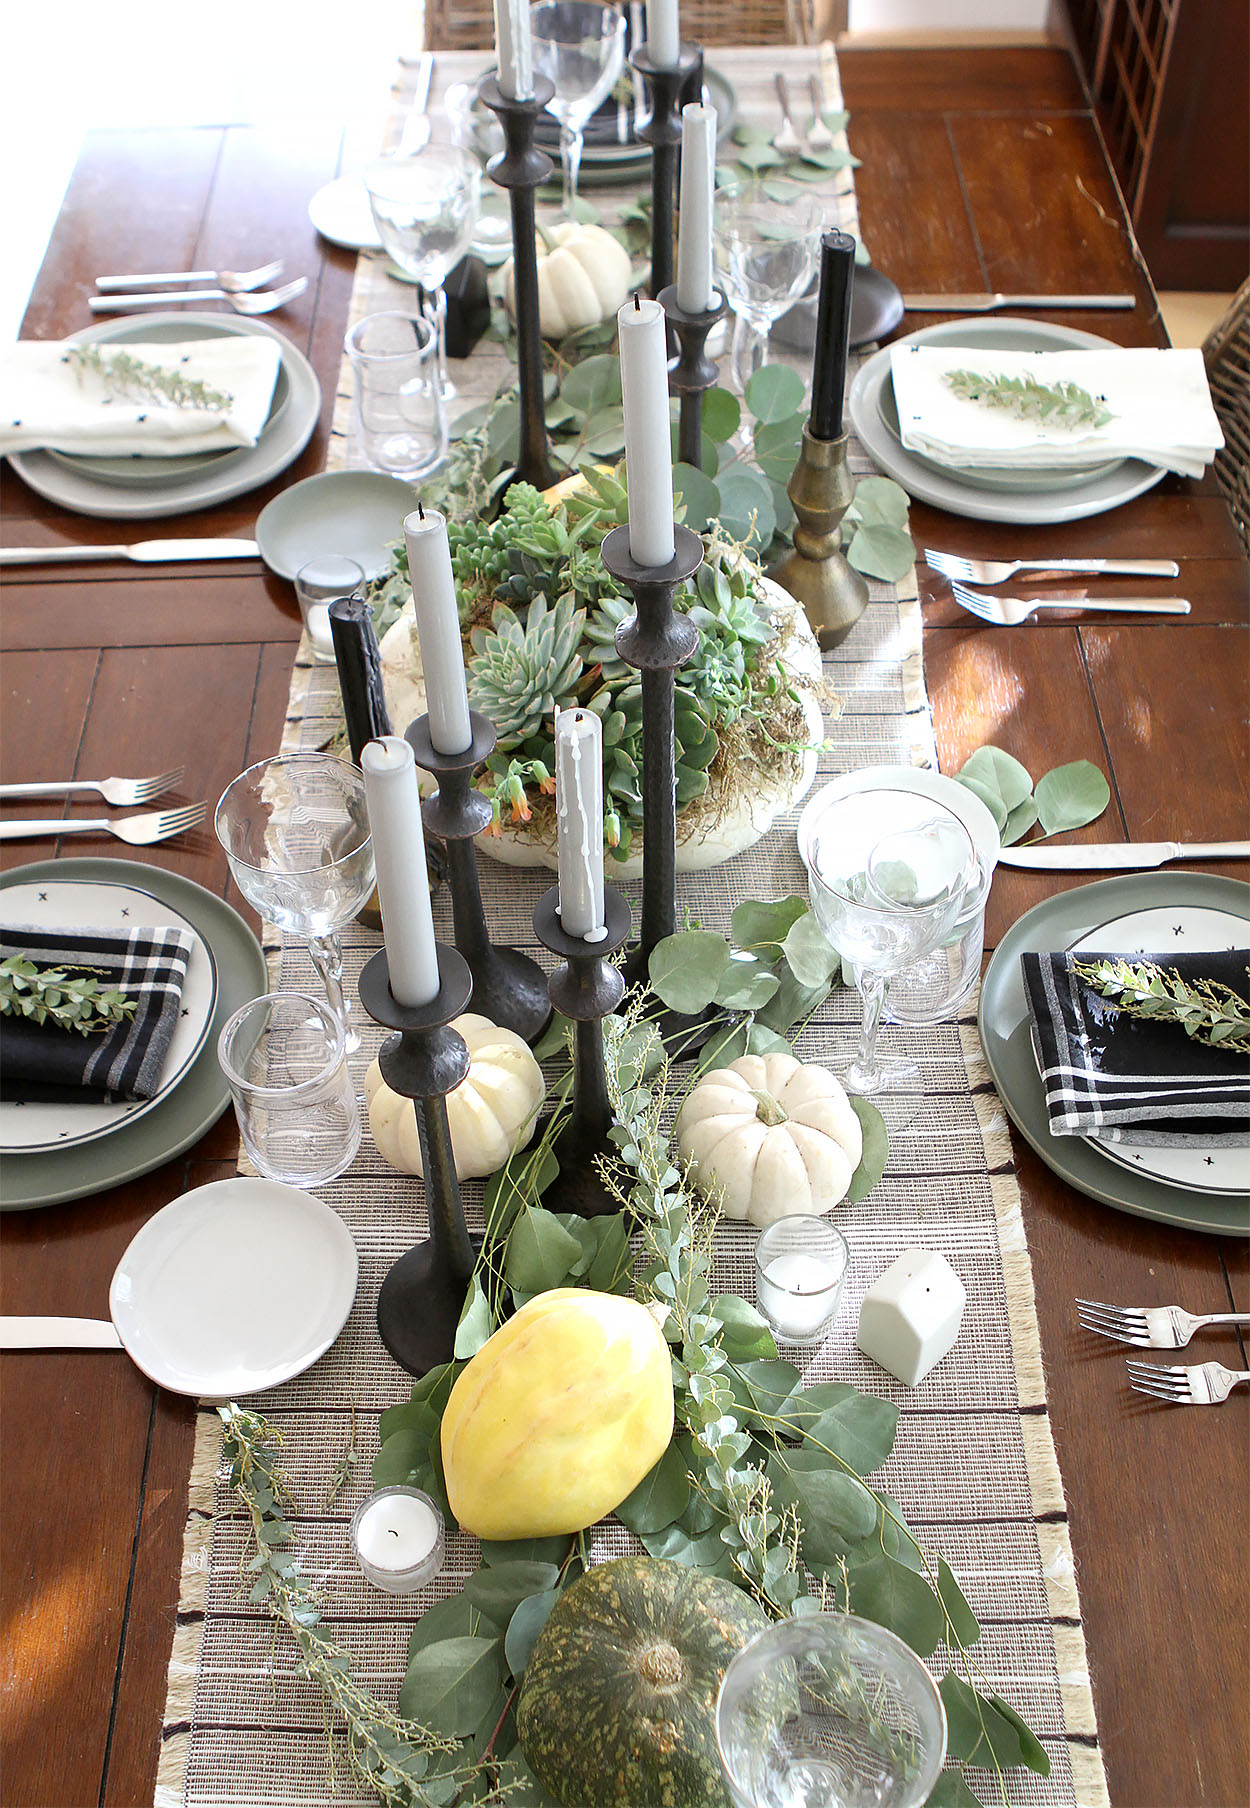 howe we live hearth and home target dishes. Black Bedroom Furniture Sets. Home Design Ideas